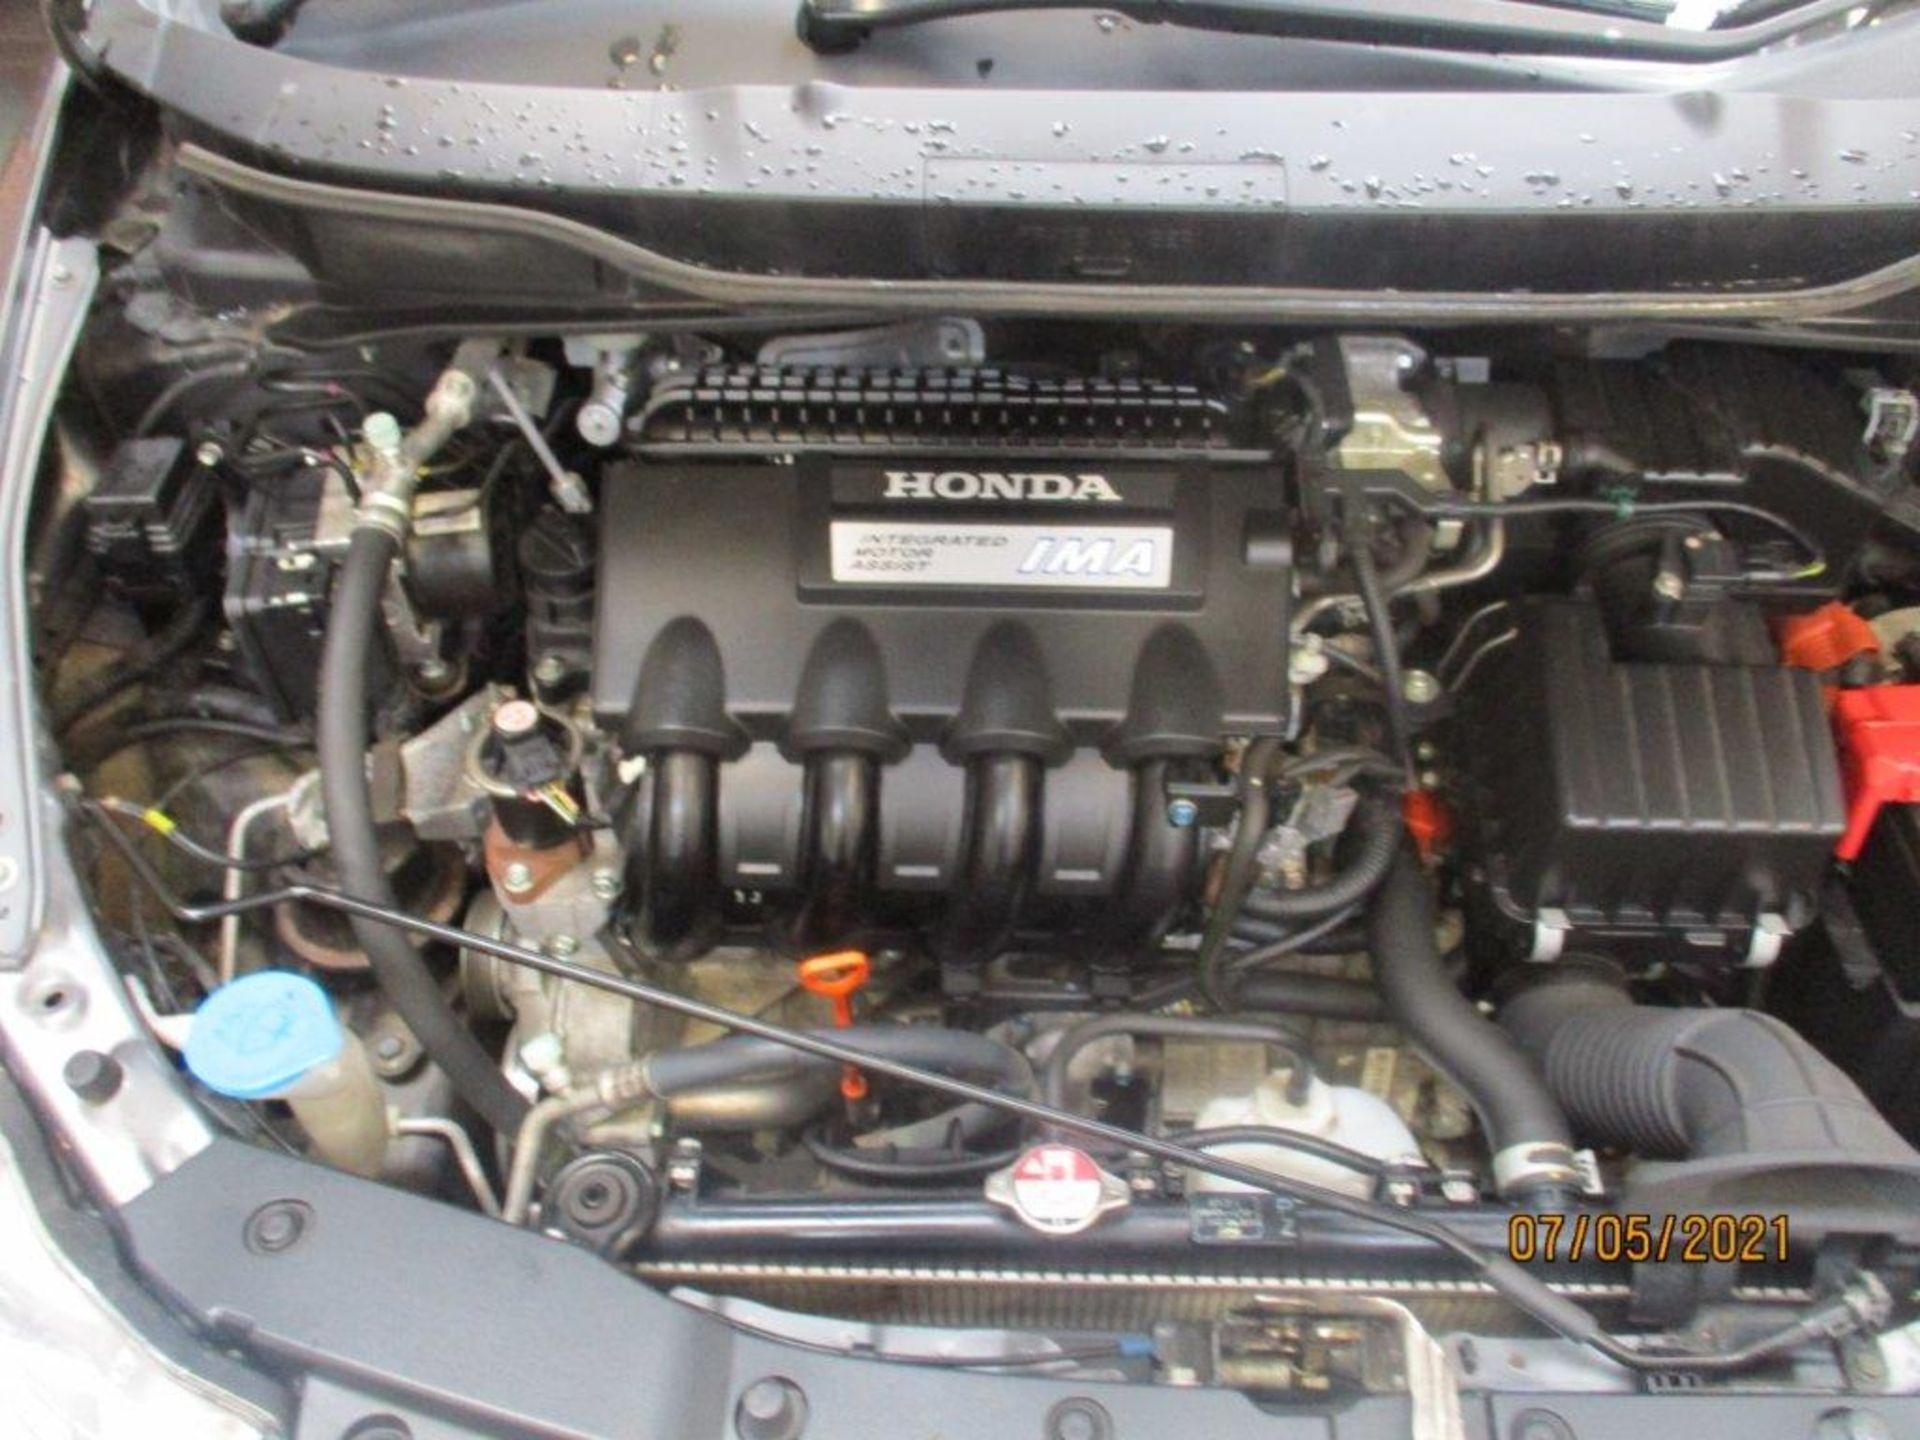 11 11 Honda Insight ES CVT - Image 6 of 21